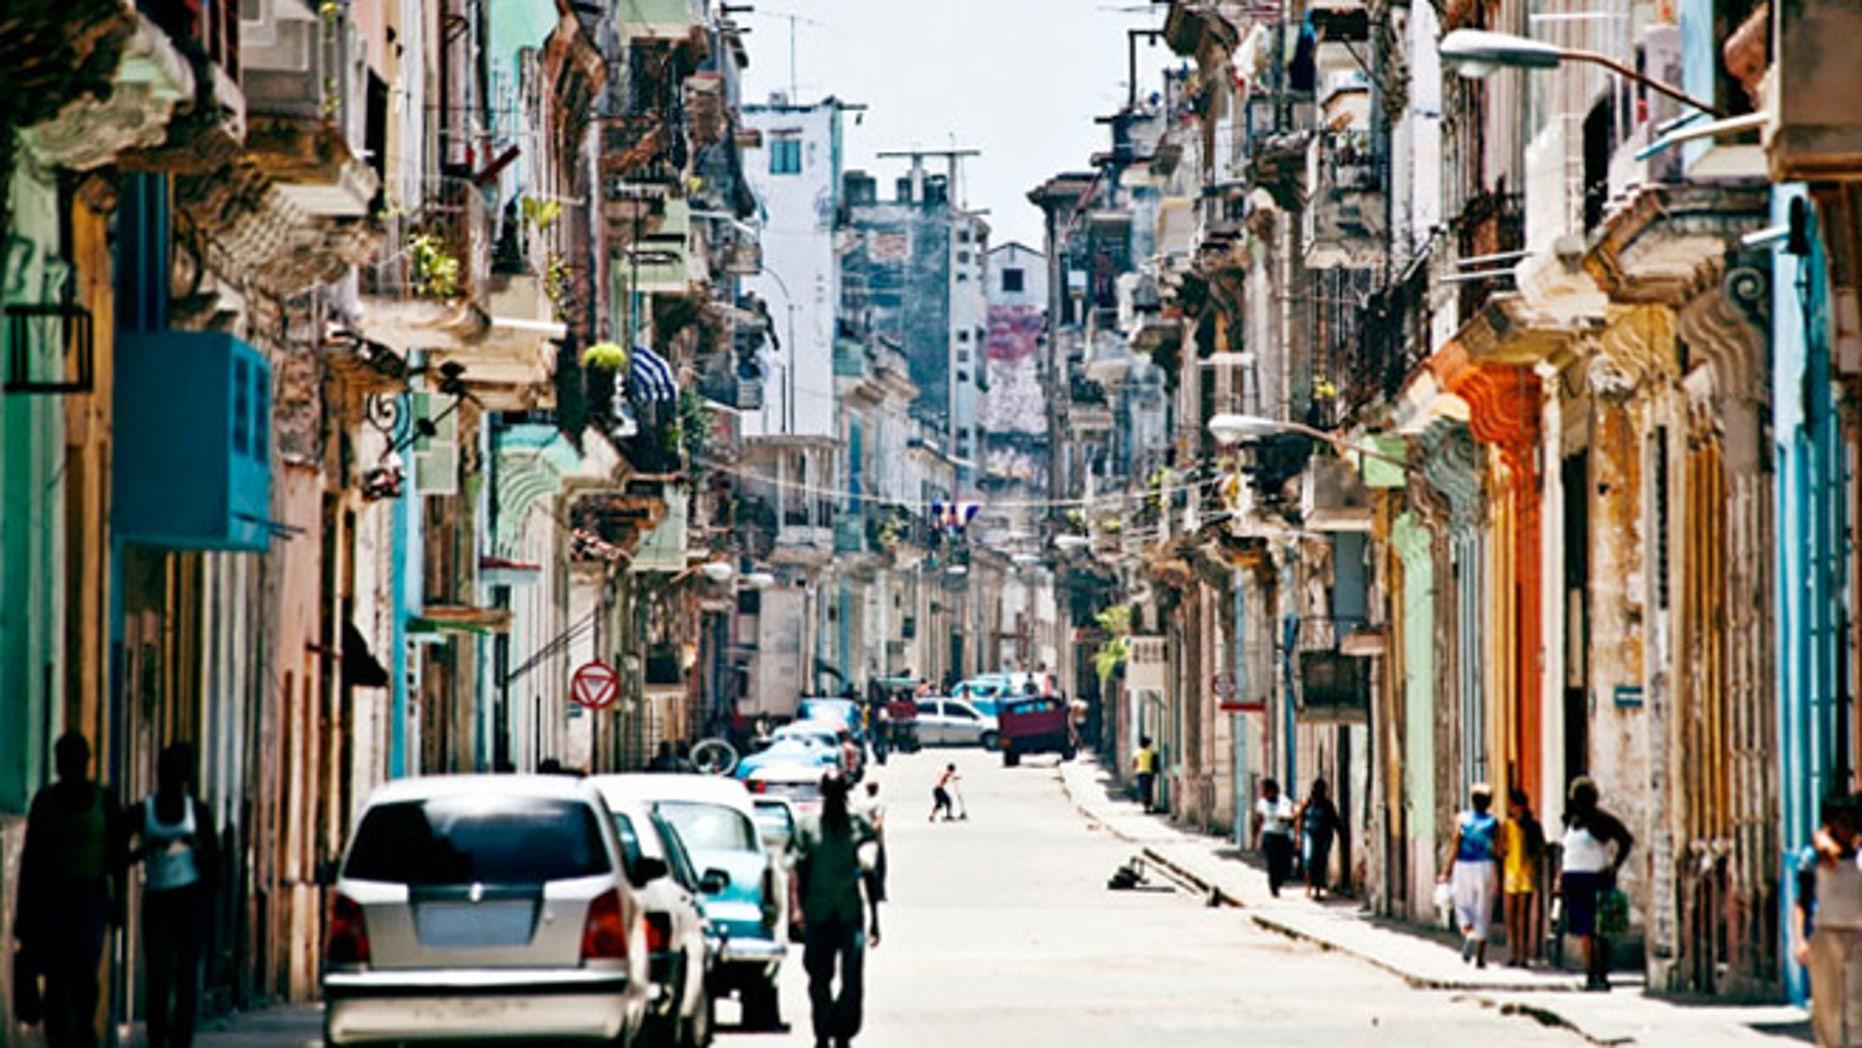 The old, rundown Havana charm is a major tourist draw to Cuba.